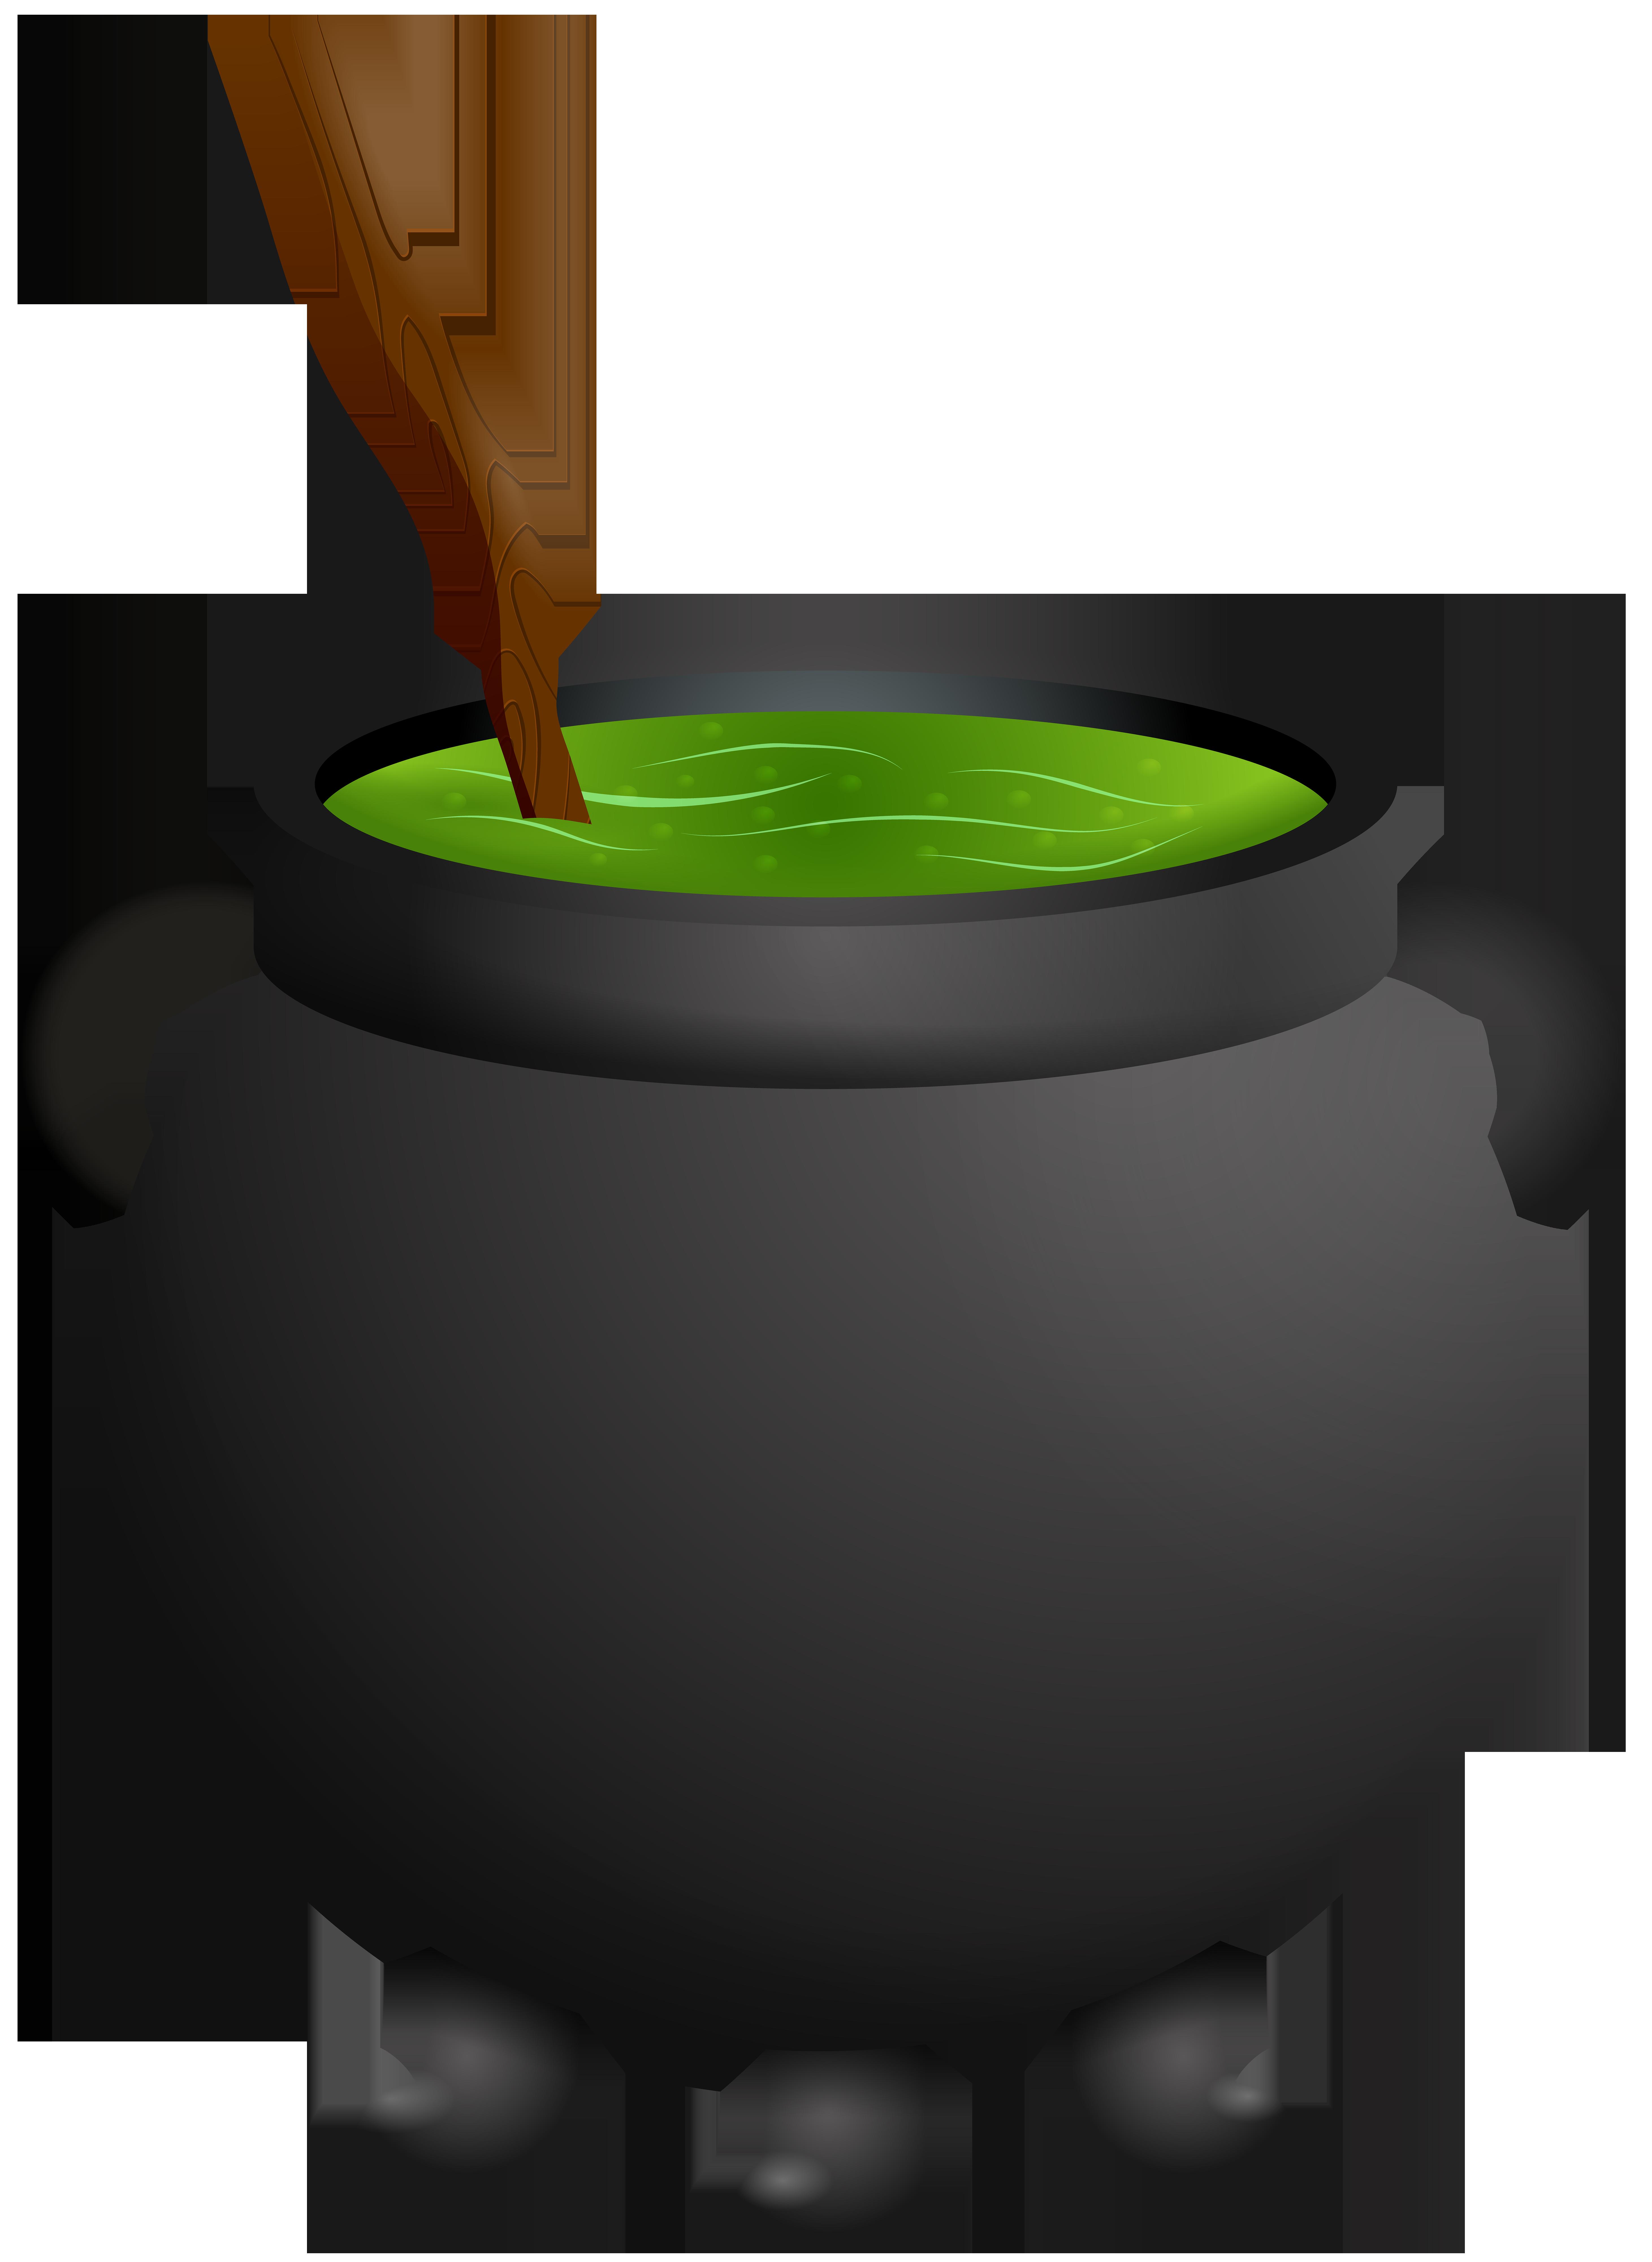 Apple butter cauldron clipart svg transparent download Cauldron Witchcraft Halloween Clip art - Halloween Witch Cauldron ... svg transparent download